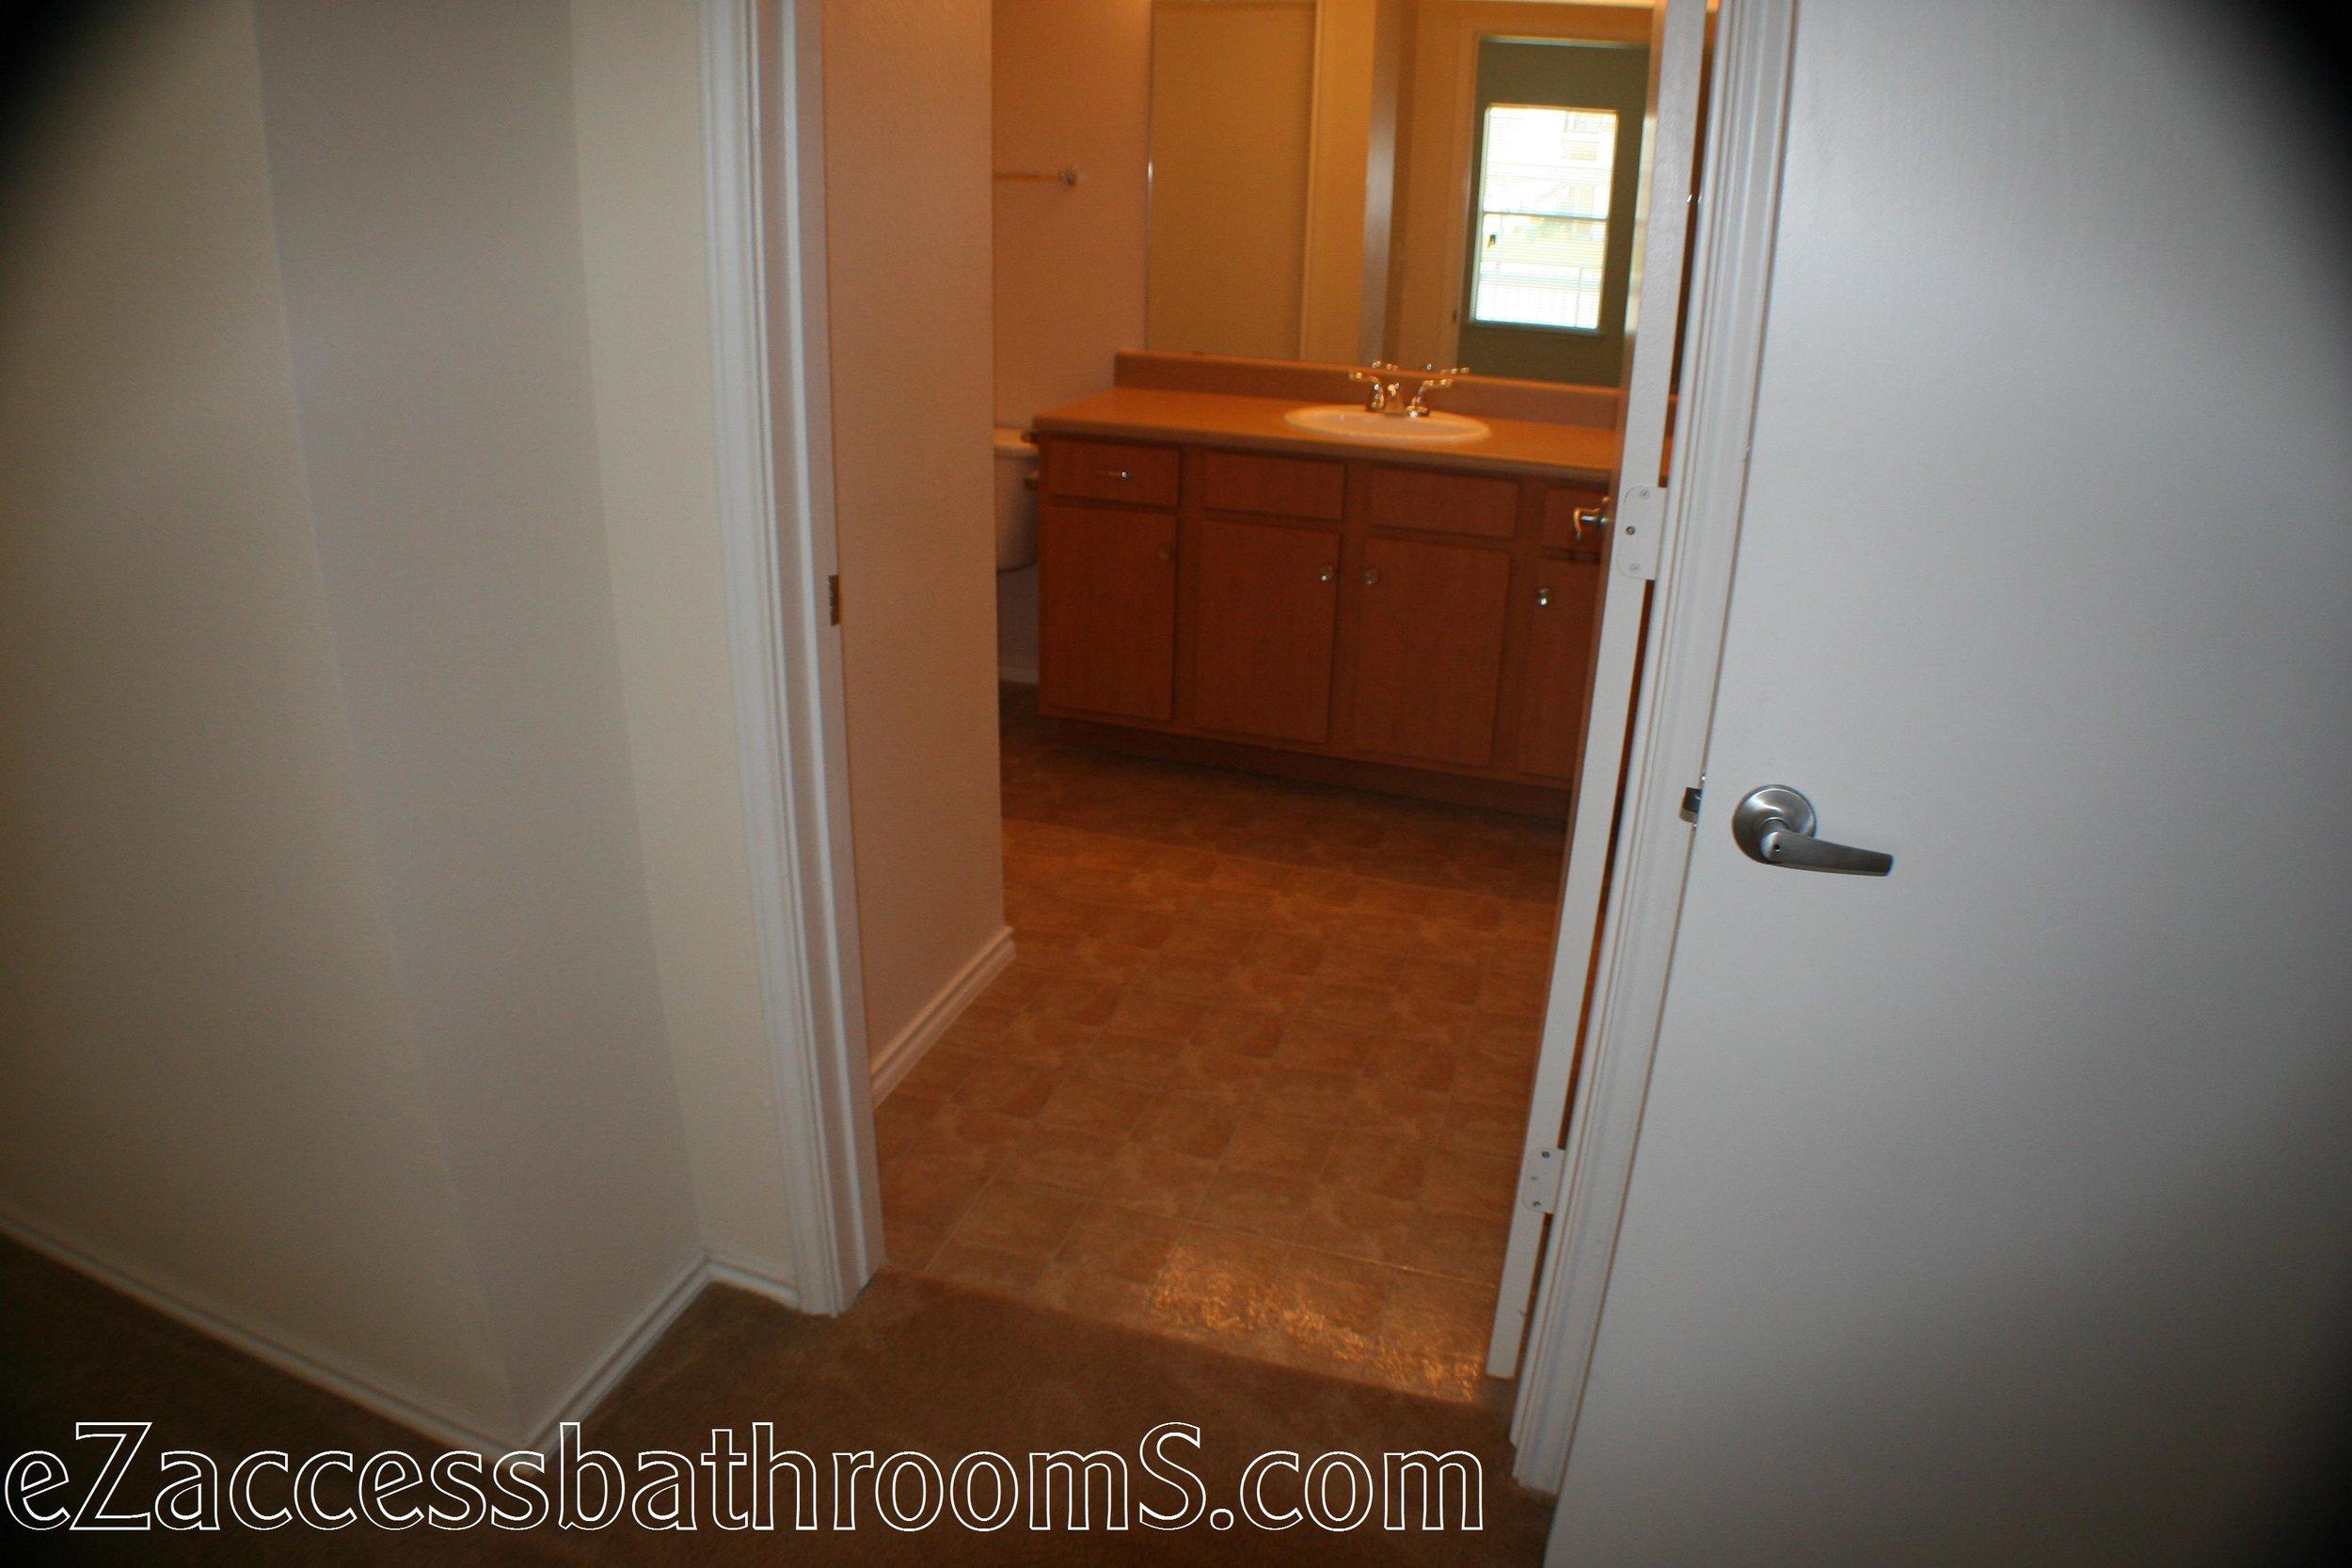 cheap tub to shower conversion ezaccessbathrooms.com 021.JPG